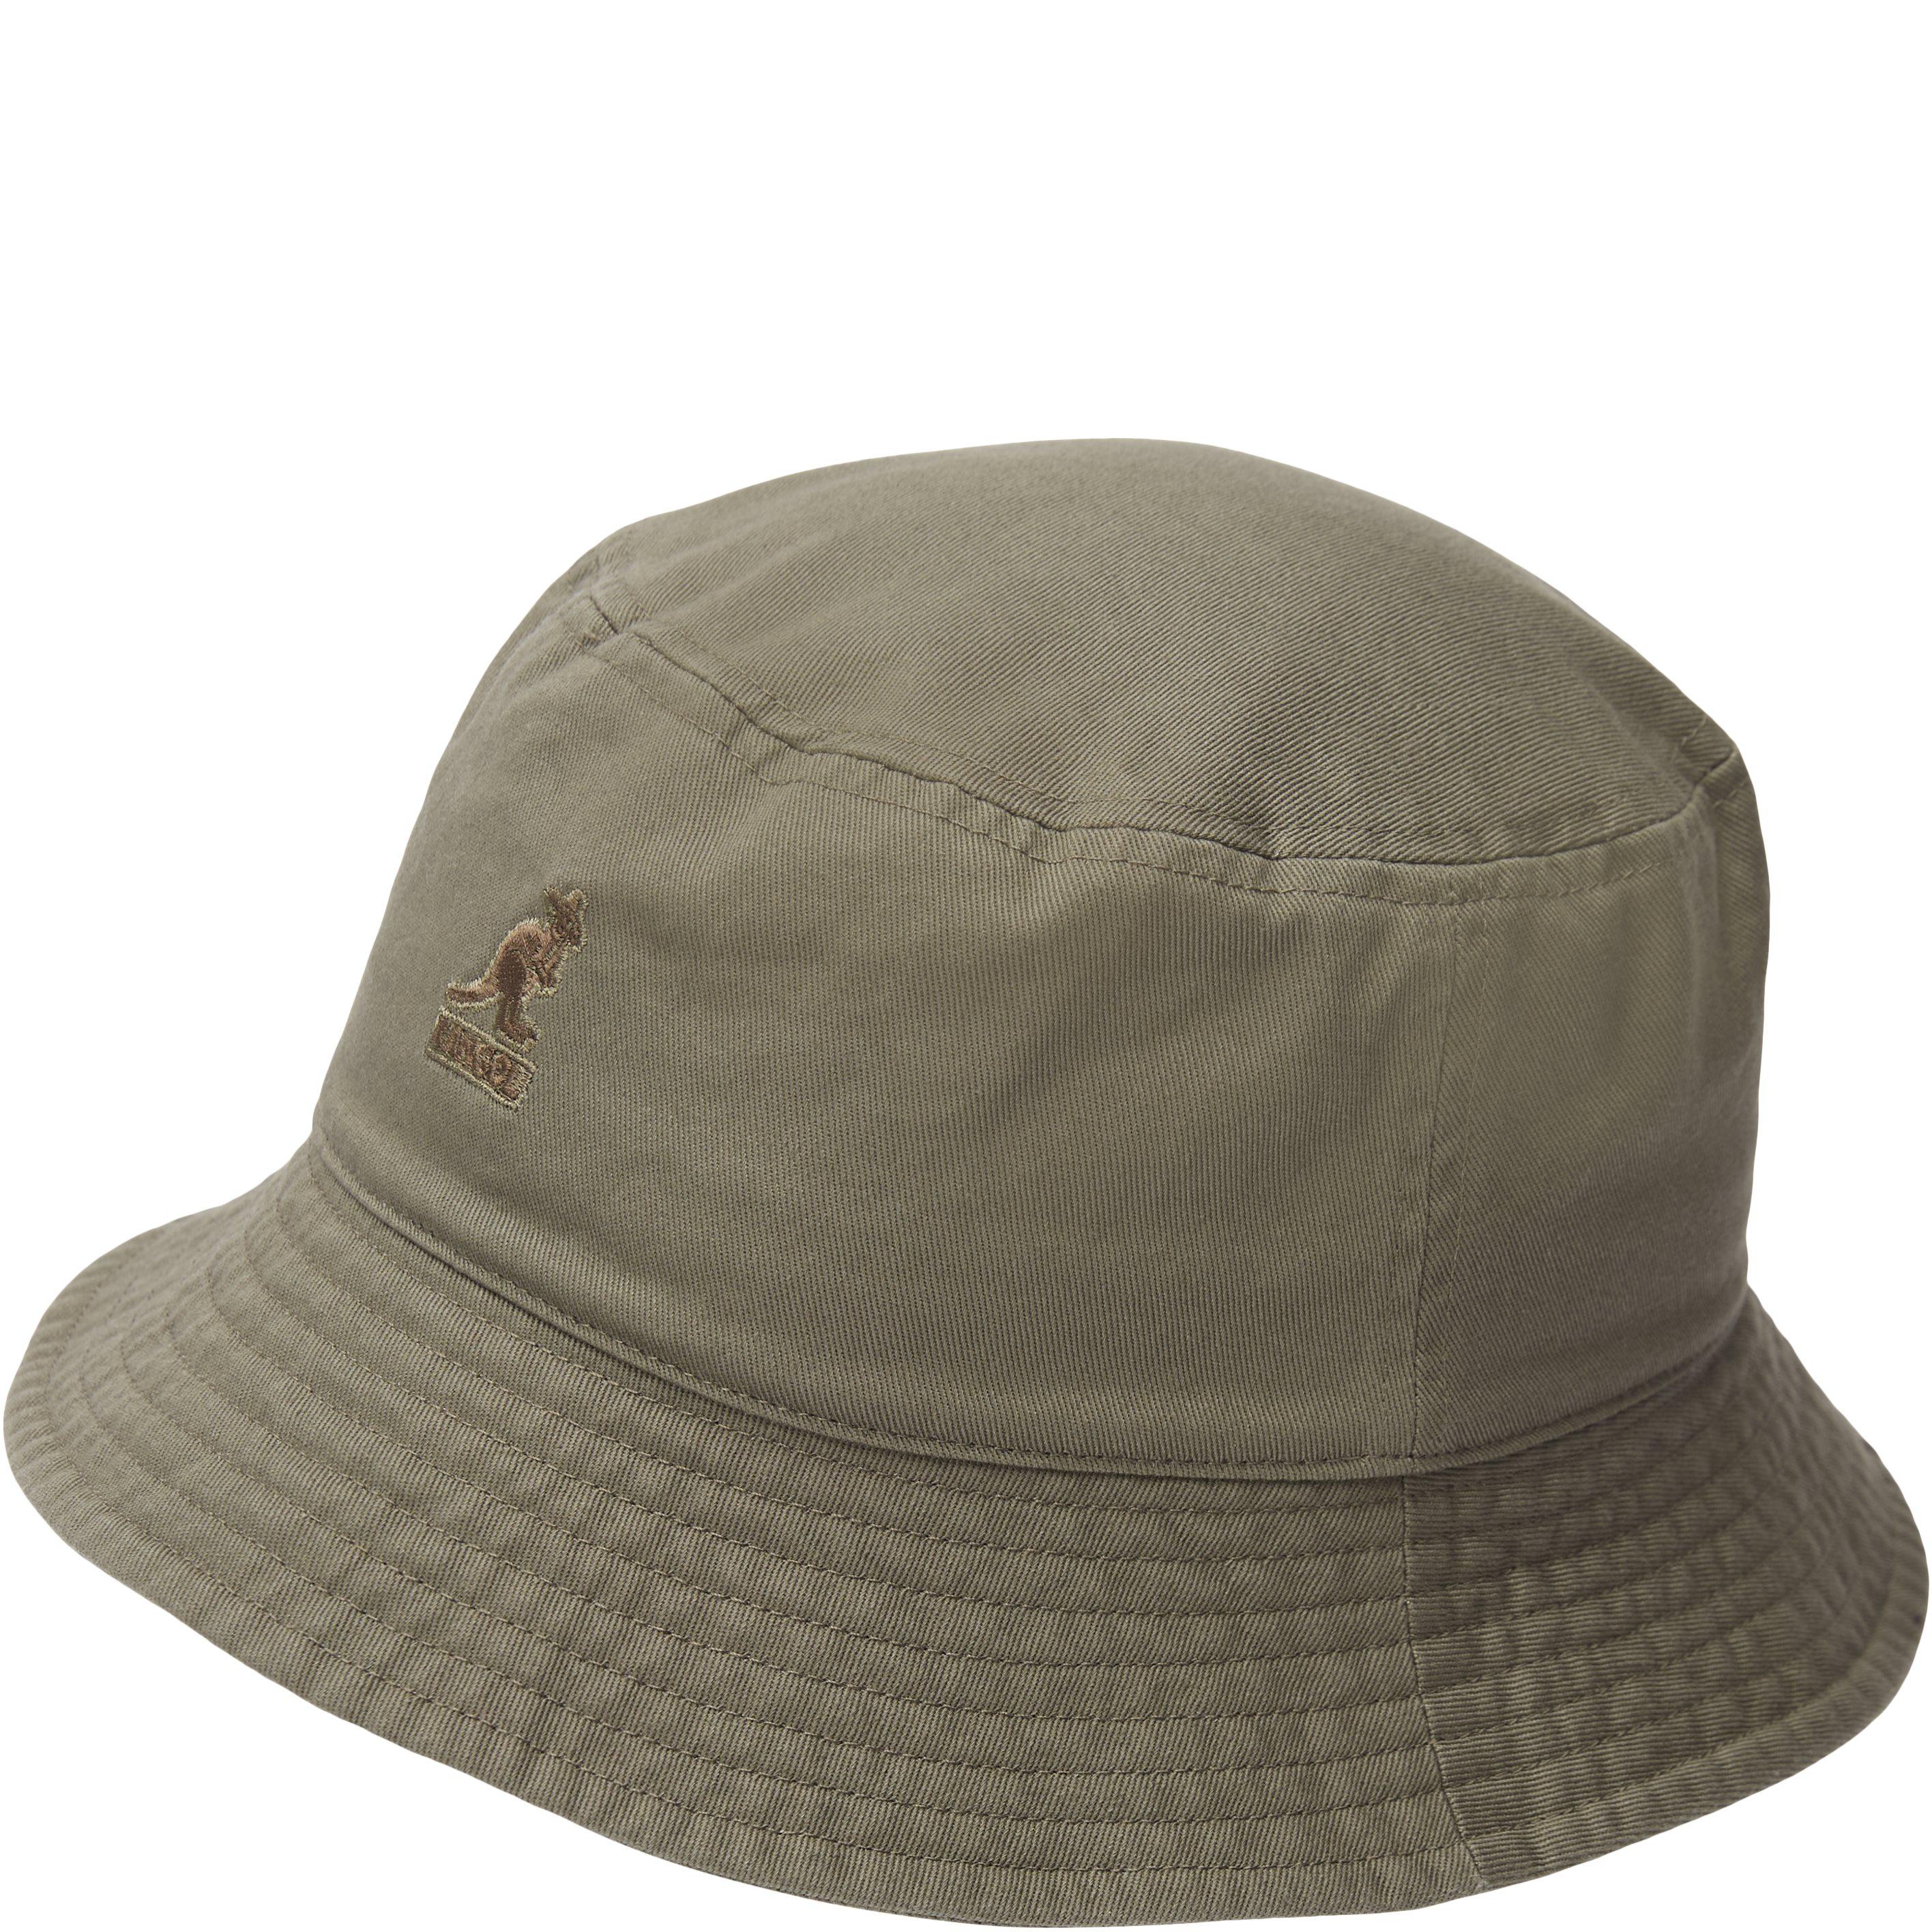 Caps - Army